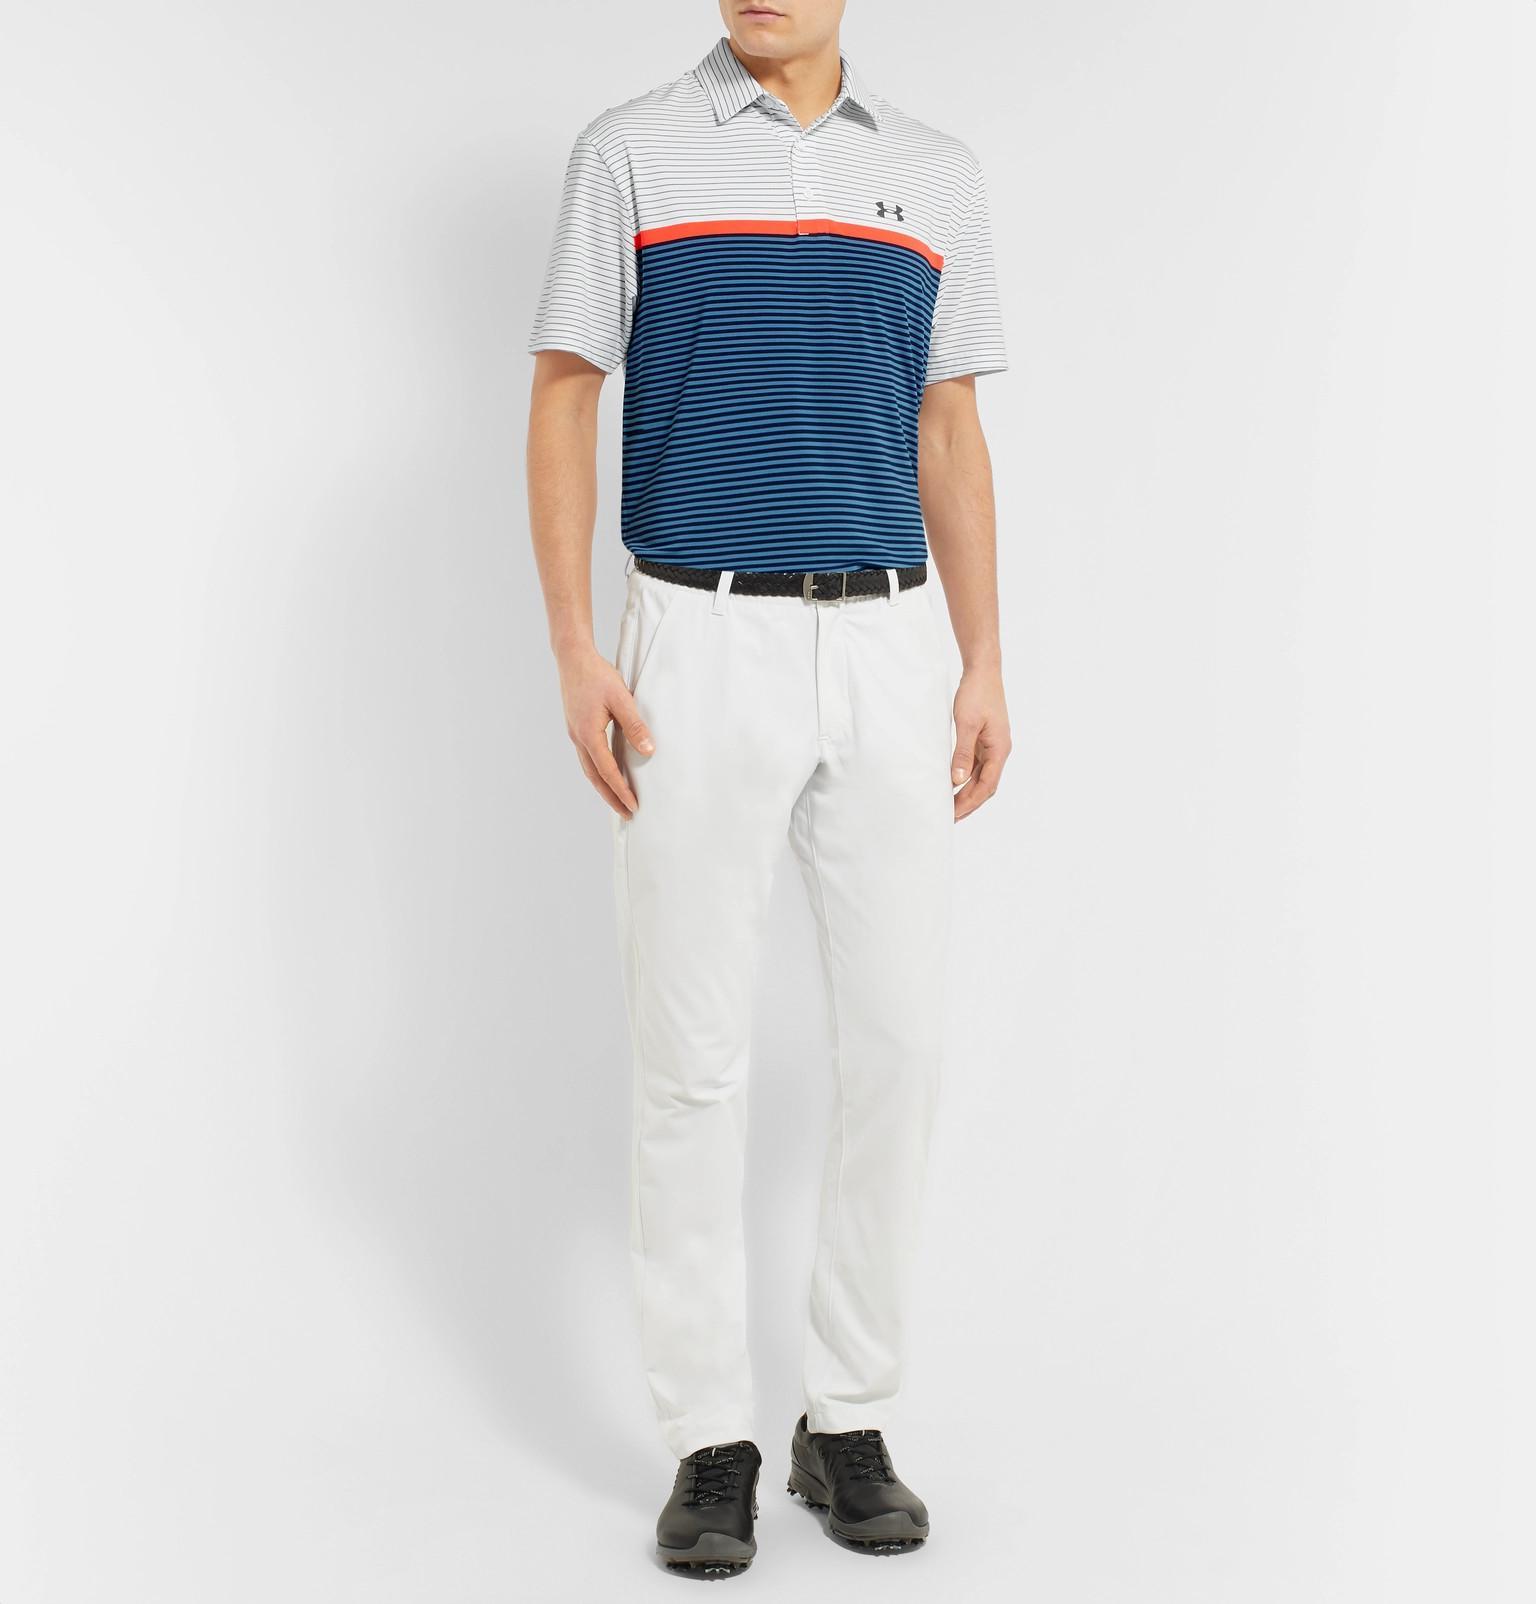 01b9eb4a98 Under Armour Playoff Striped Heatgear Golf Polo Shirt in White for ...